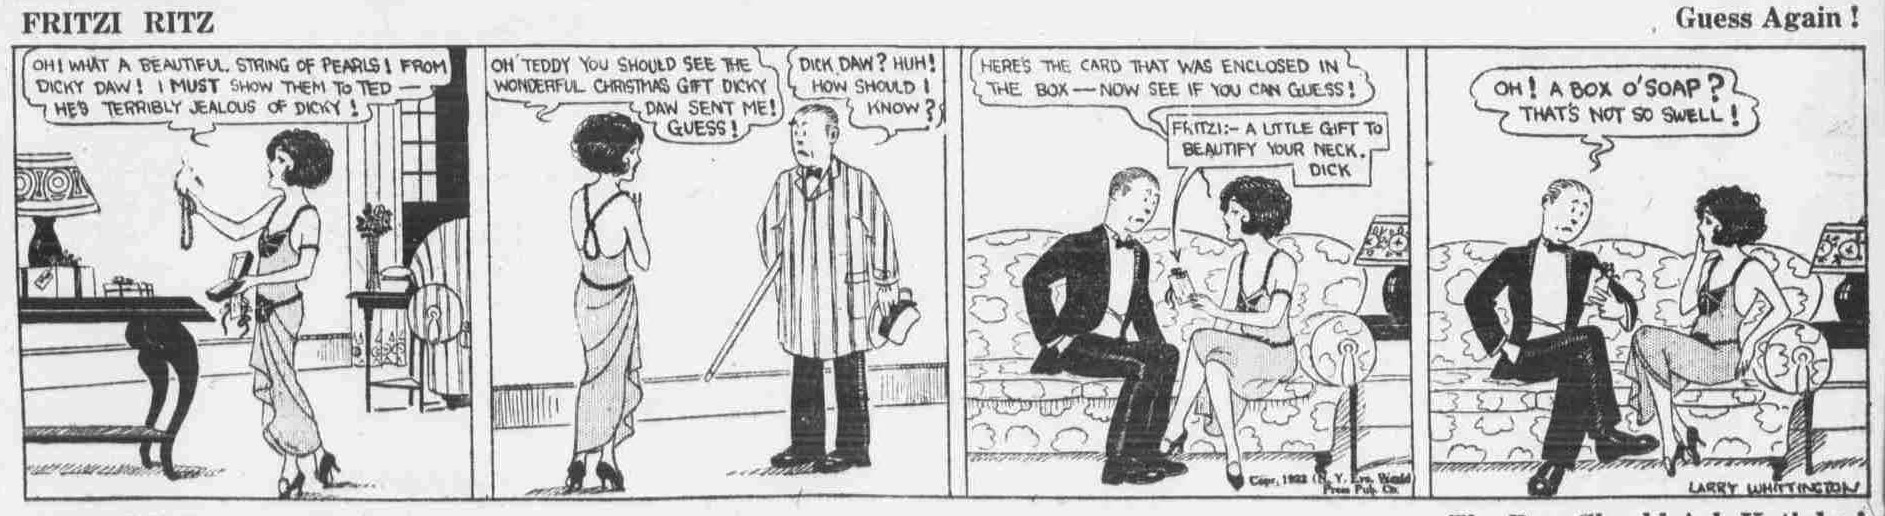 Dec. 22, 1922